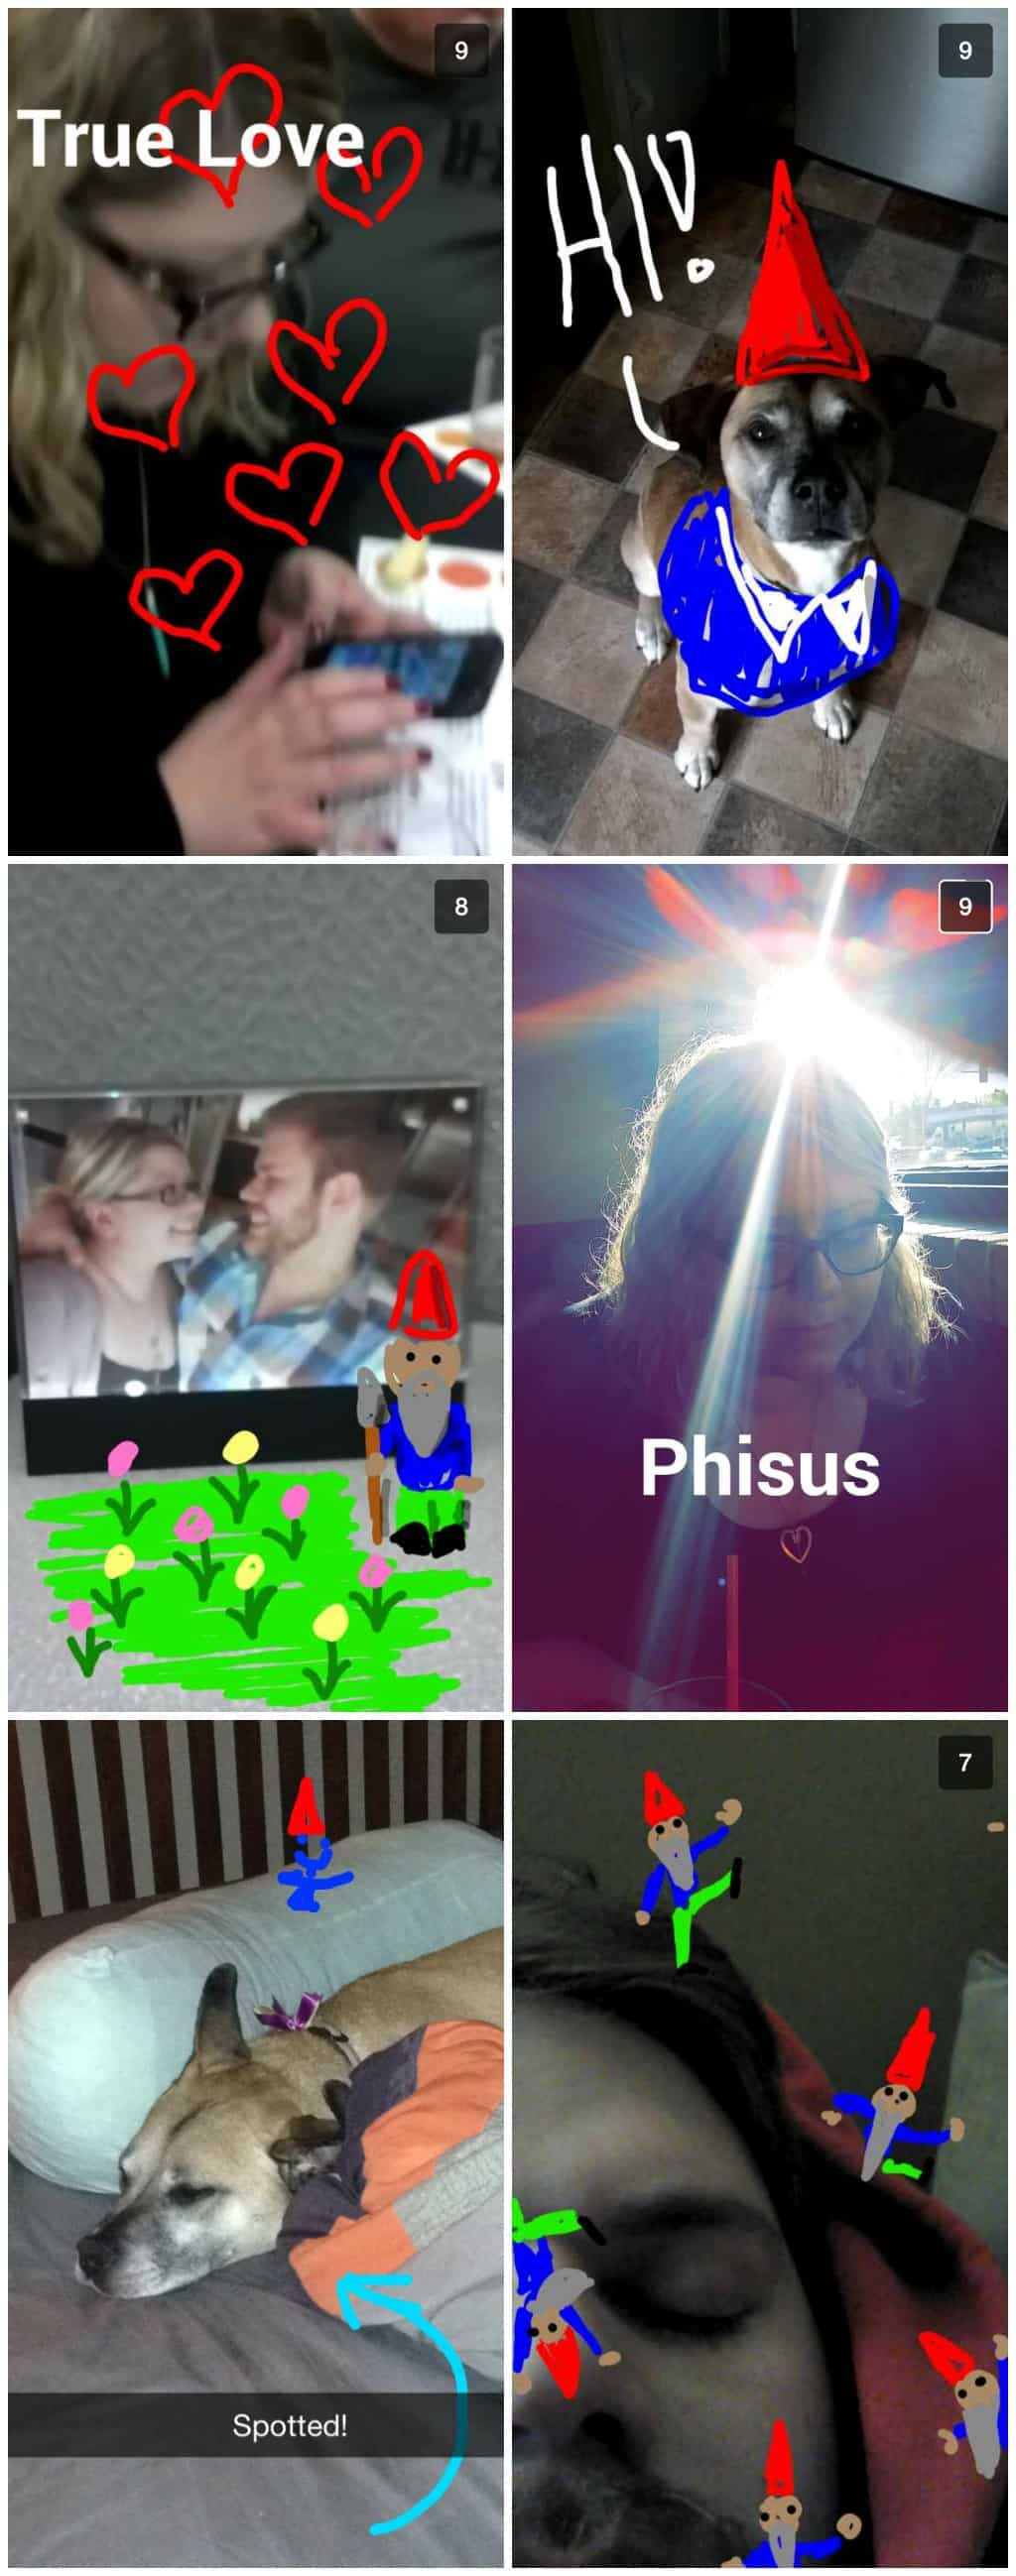 Sweetphi on Snapchat